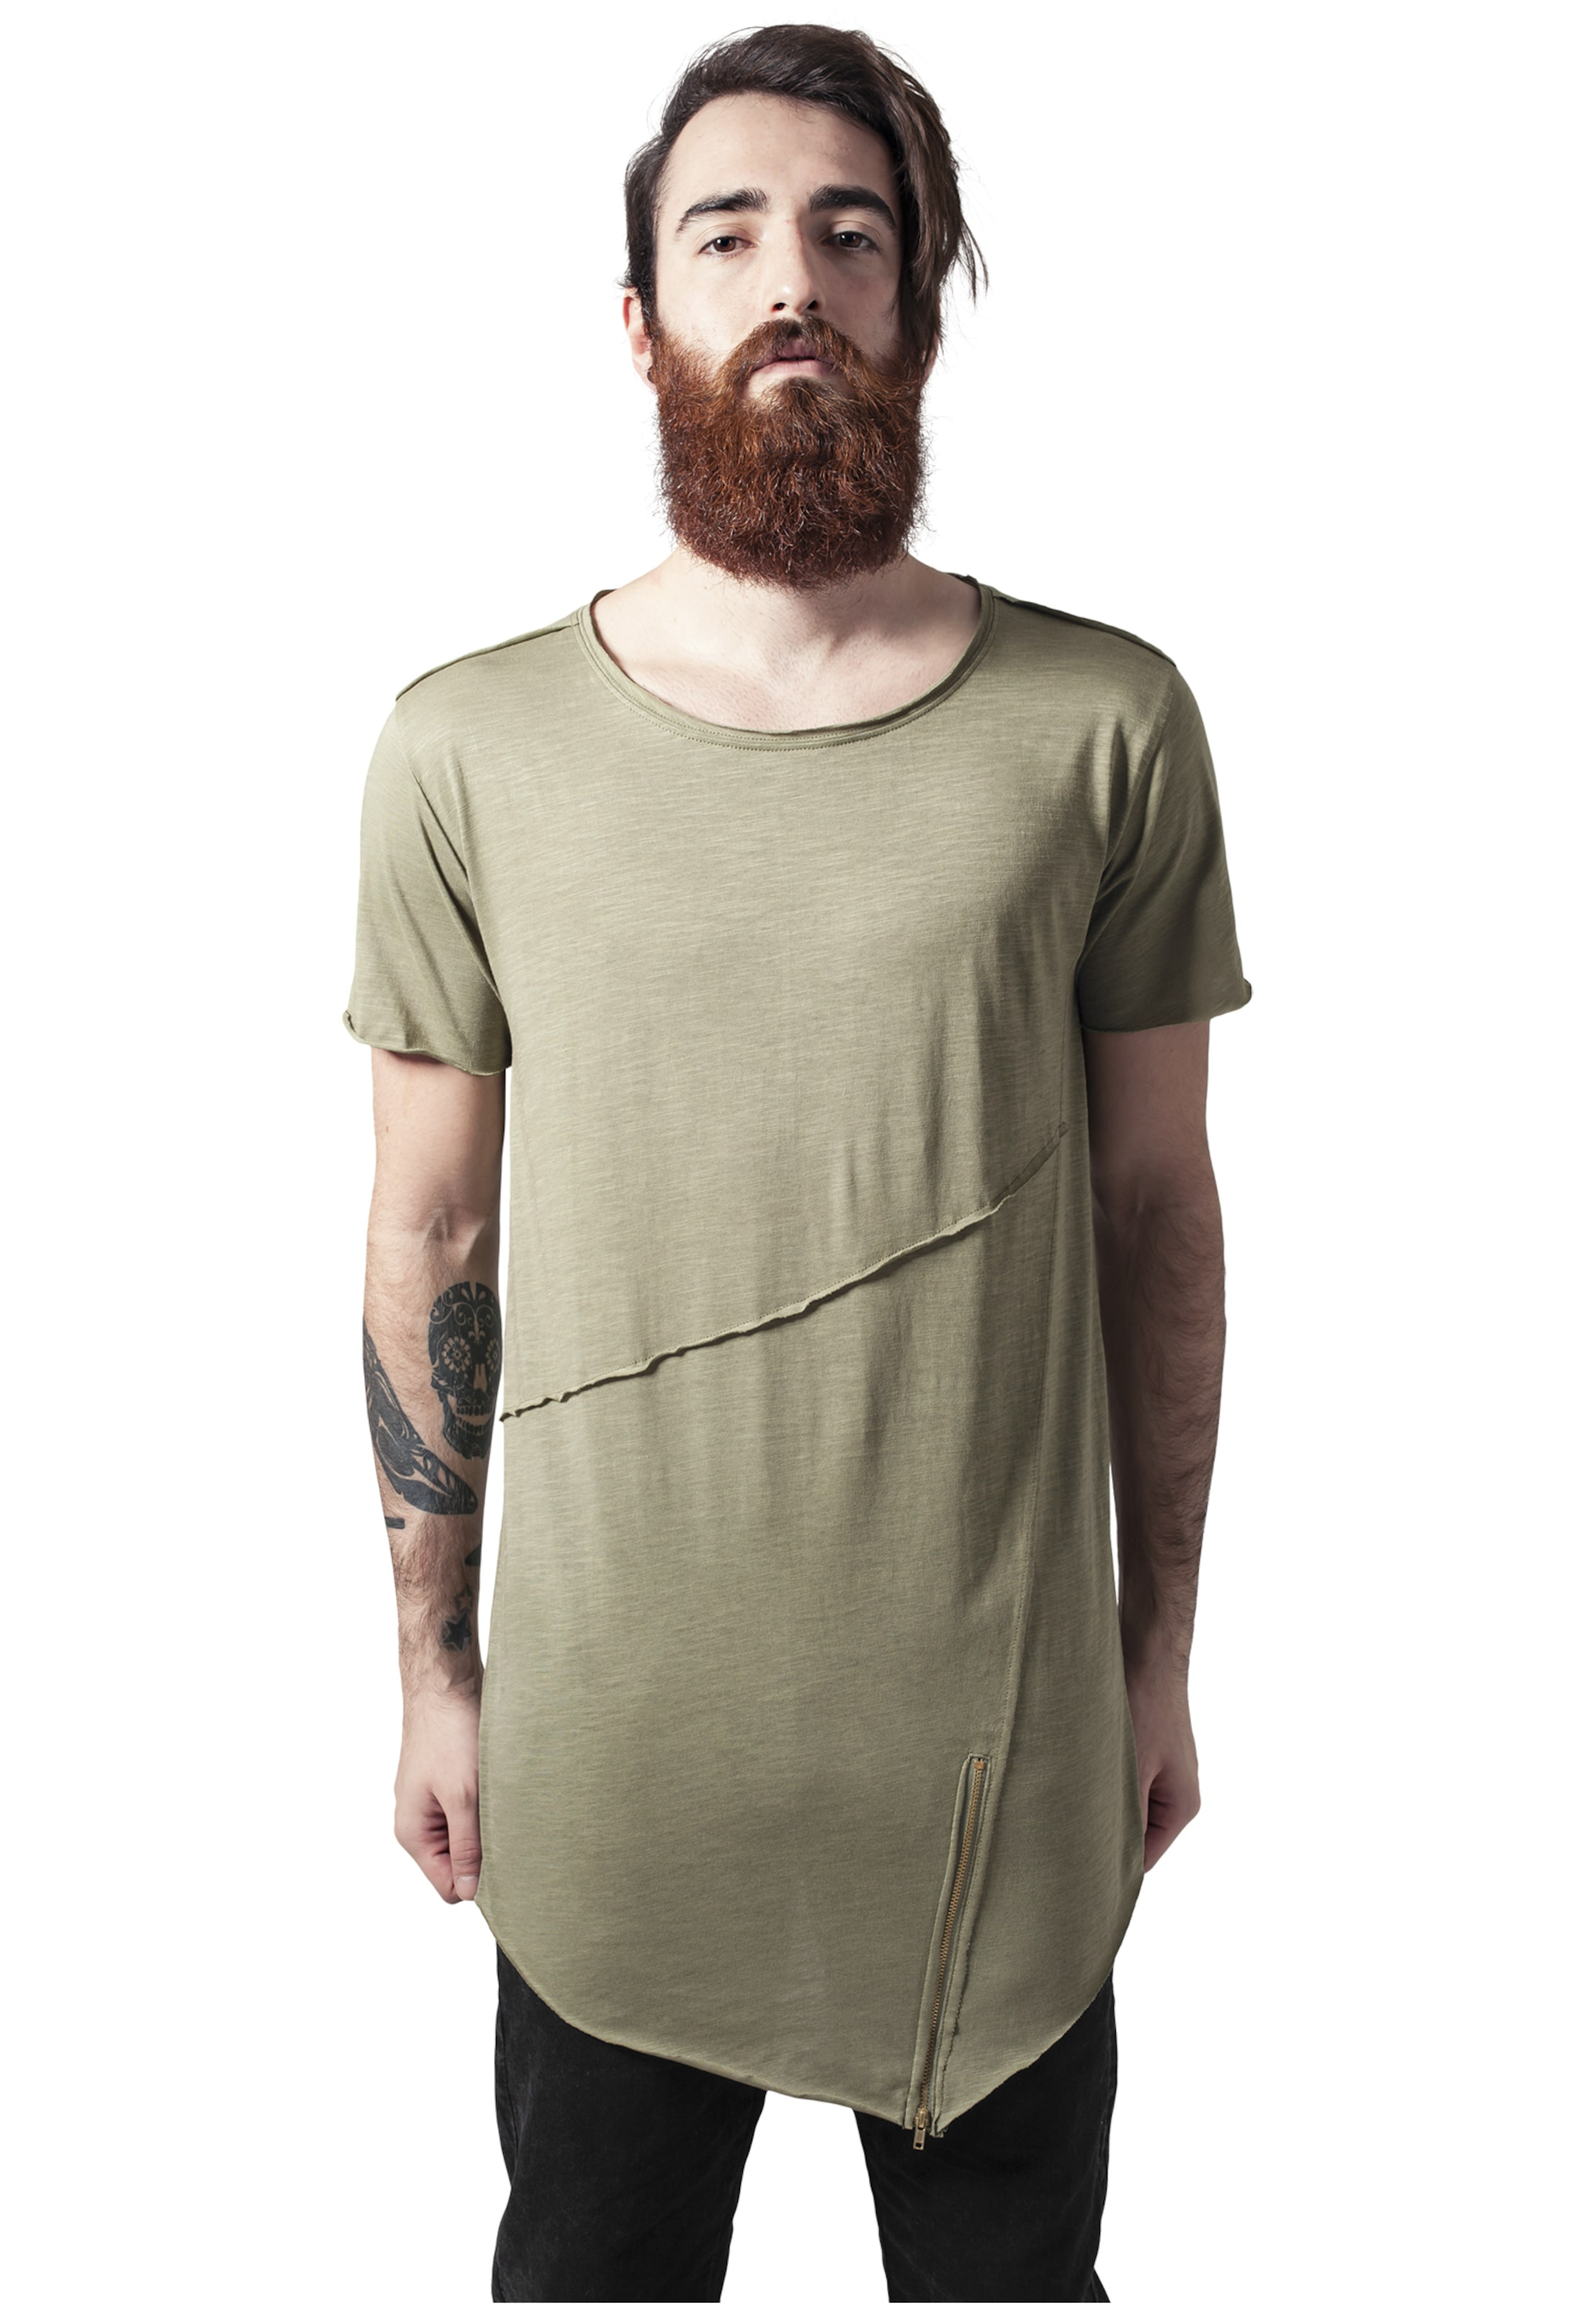 Classics Edge' In Urban Shirt Oliv 'open VGSUzpqM